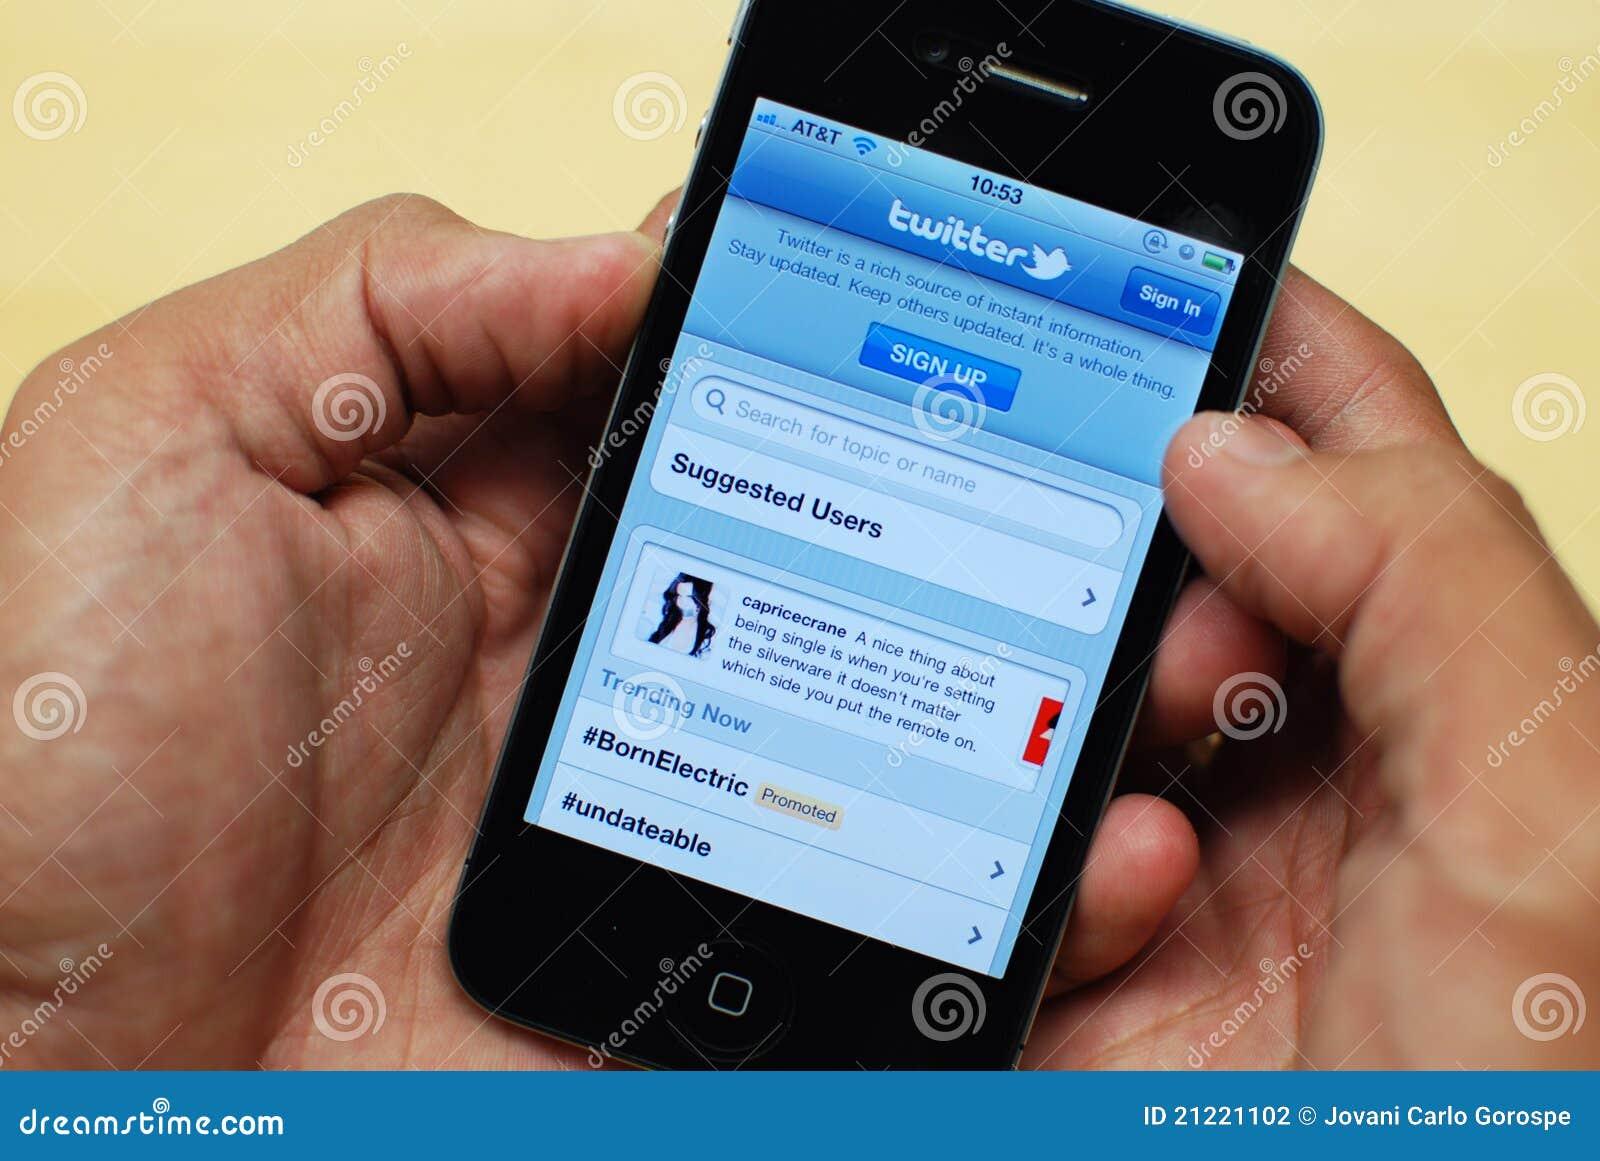 Twitter sul iPhone 4